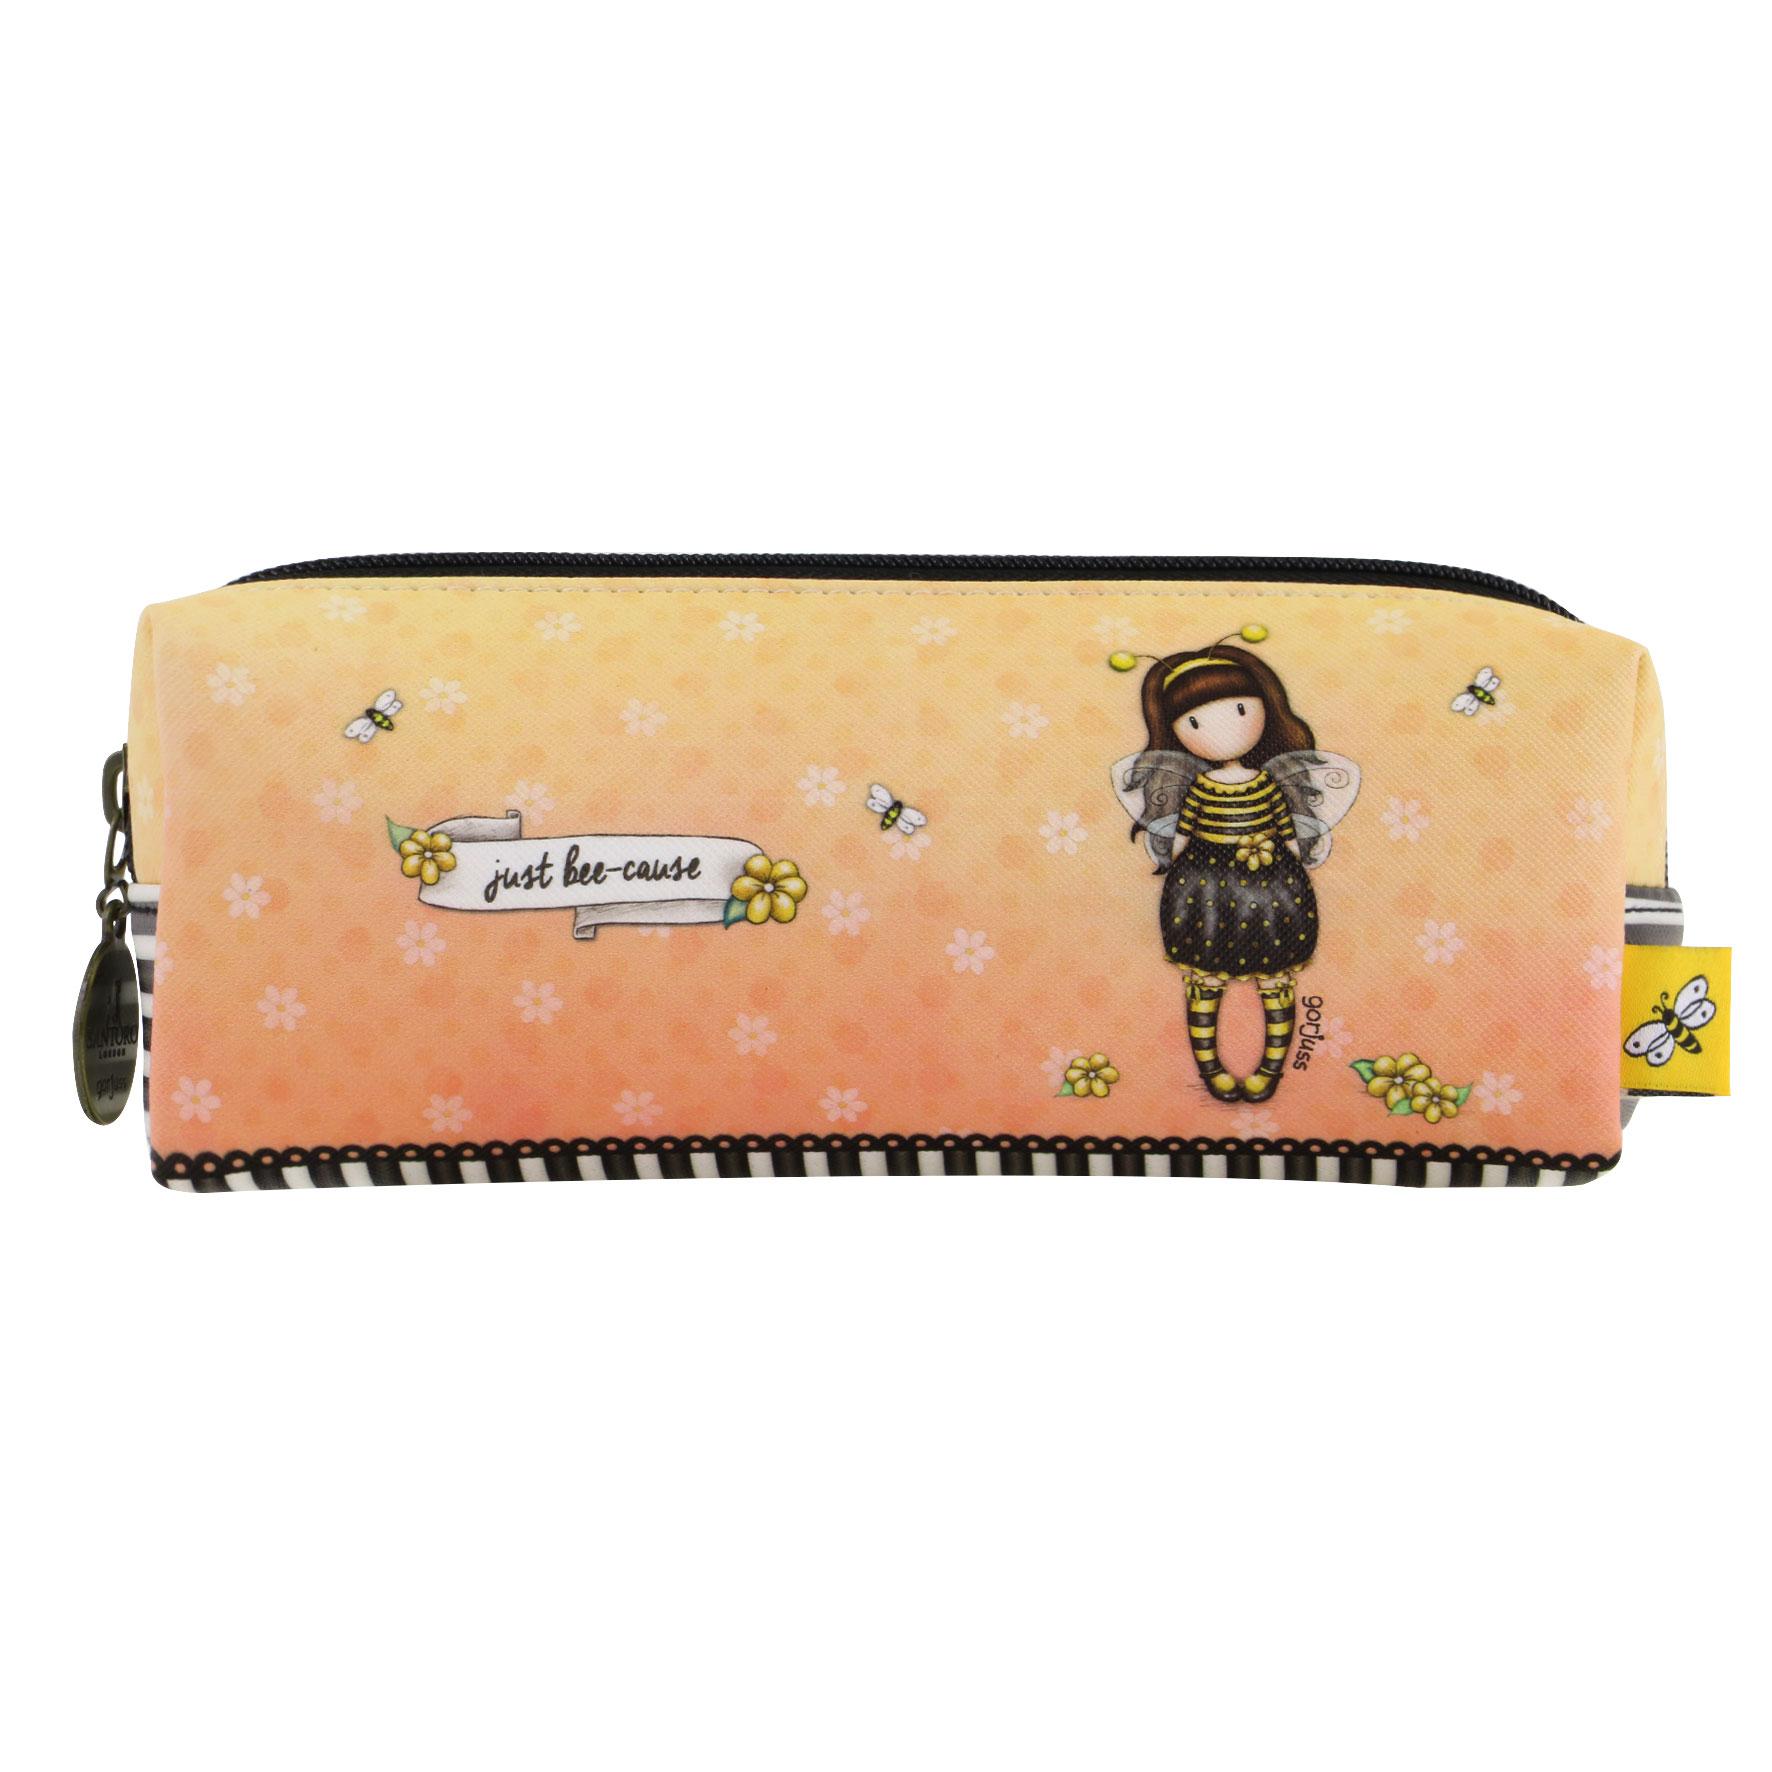 Santoro London - Pouzdro/Kosmetická taška - Gorjuss - Bee-Loved (Just Bee-Cause) Černá, žlutá, béžová